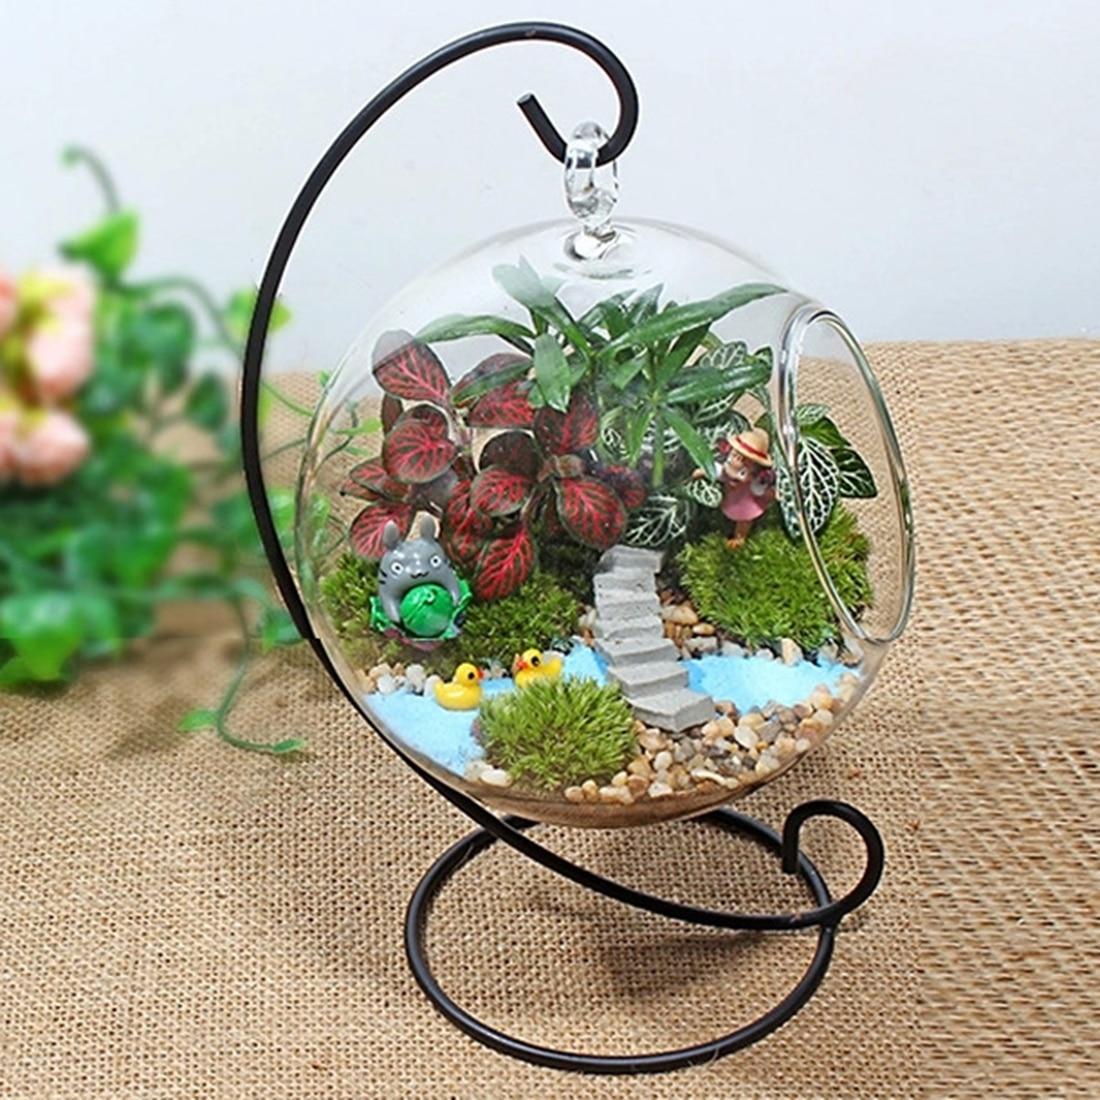 0d0f5b6da Jarrón de bola de cristal transparente creativo Micro paisaje planta de  aire terrario suculento colgante florero contenedor jarrones de flores para  casas